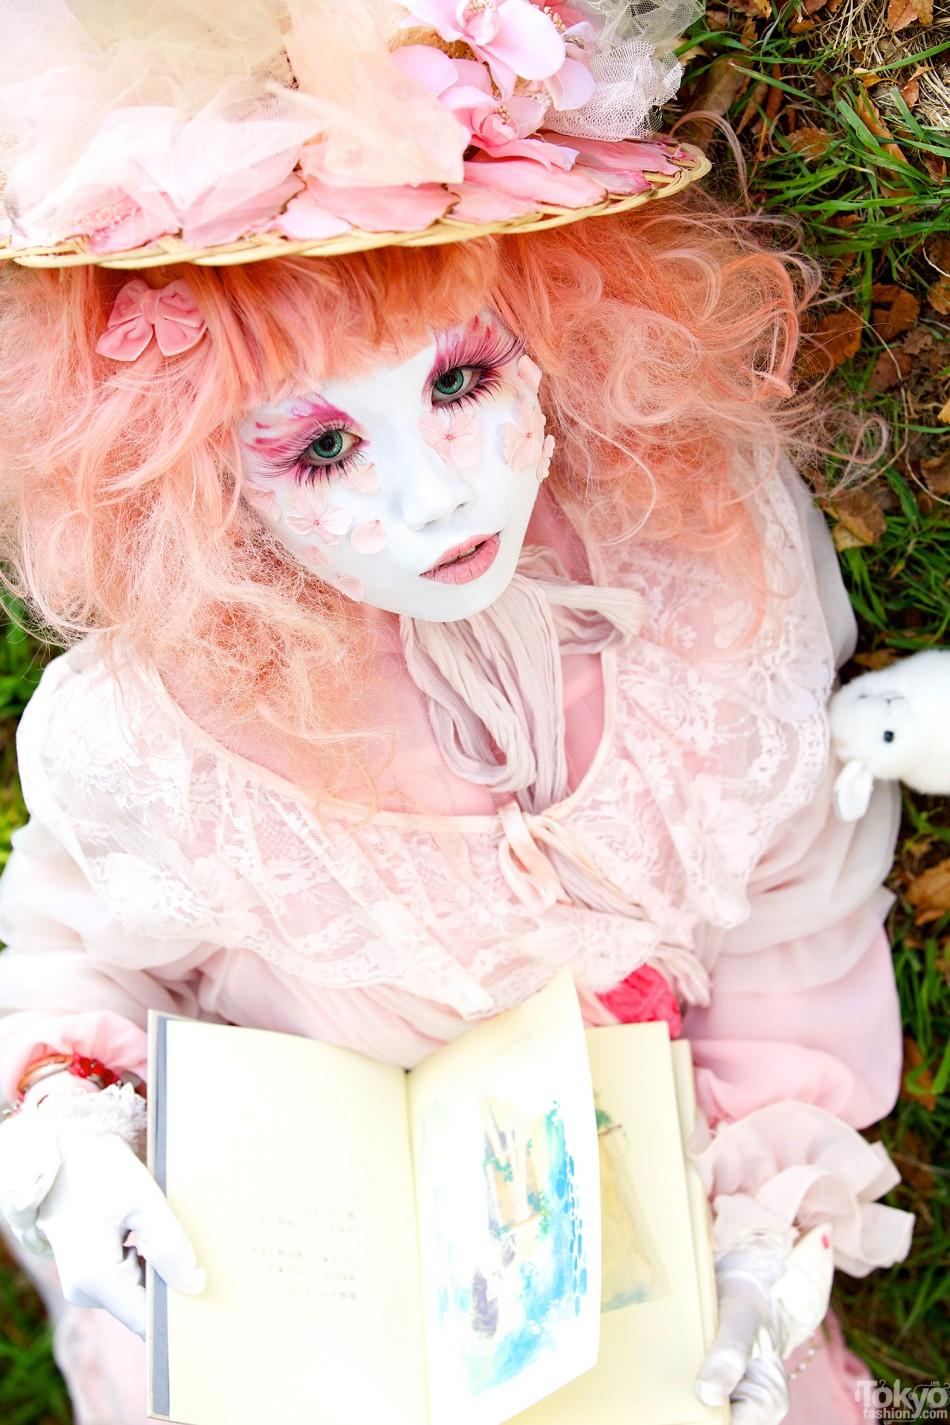 Minori - Her Memories of a Dream (40)